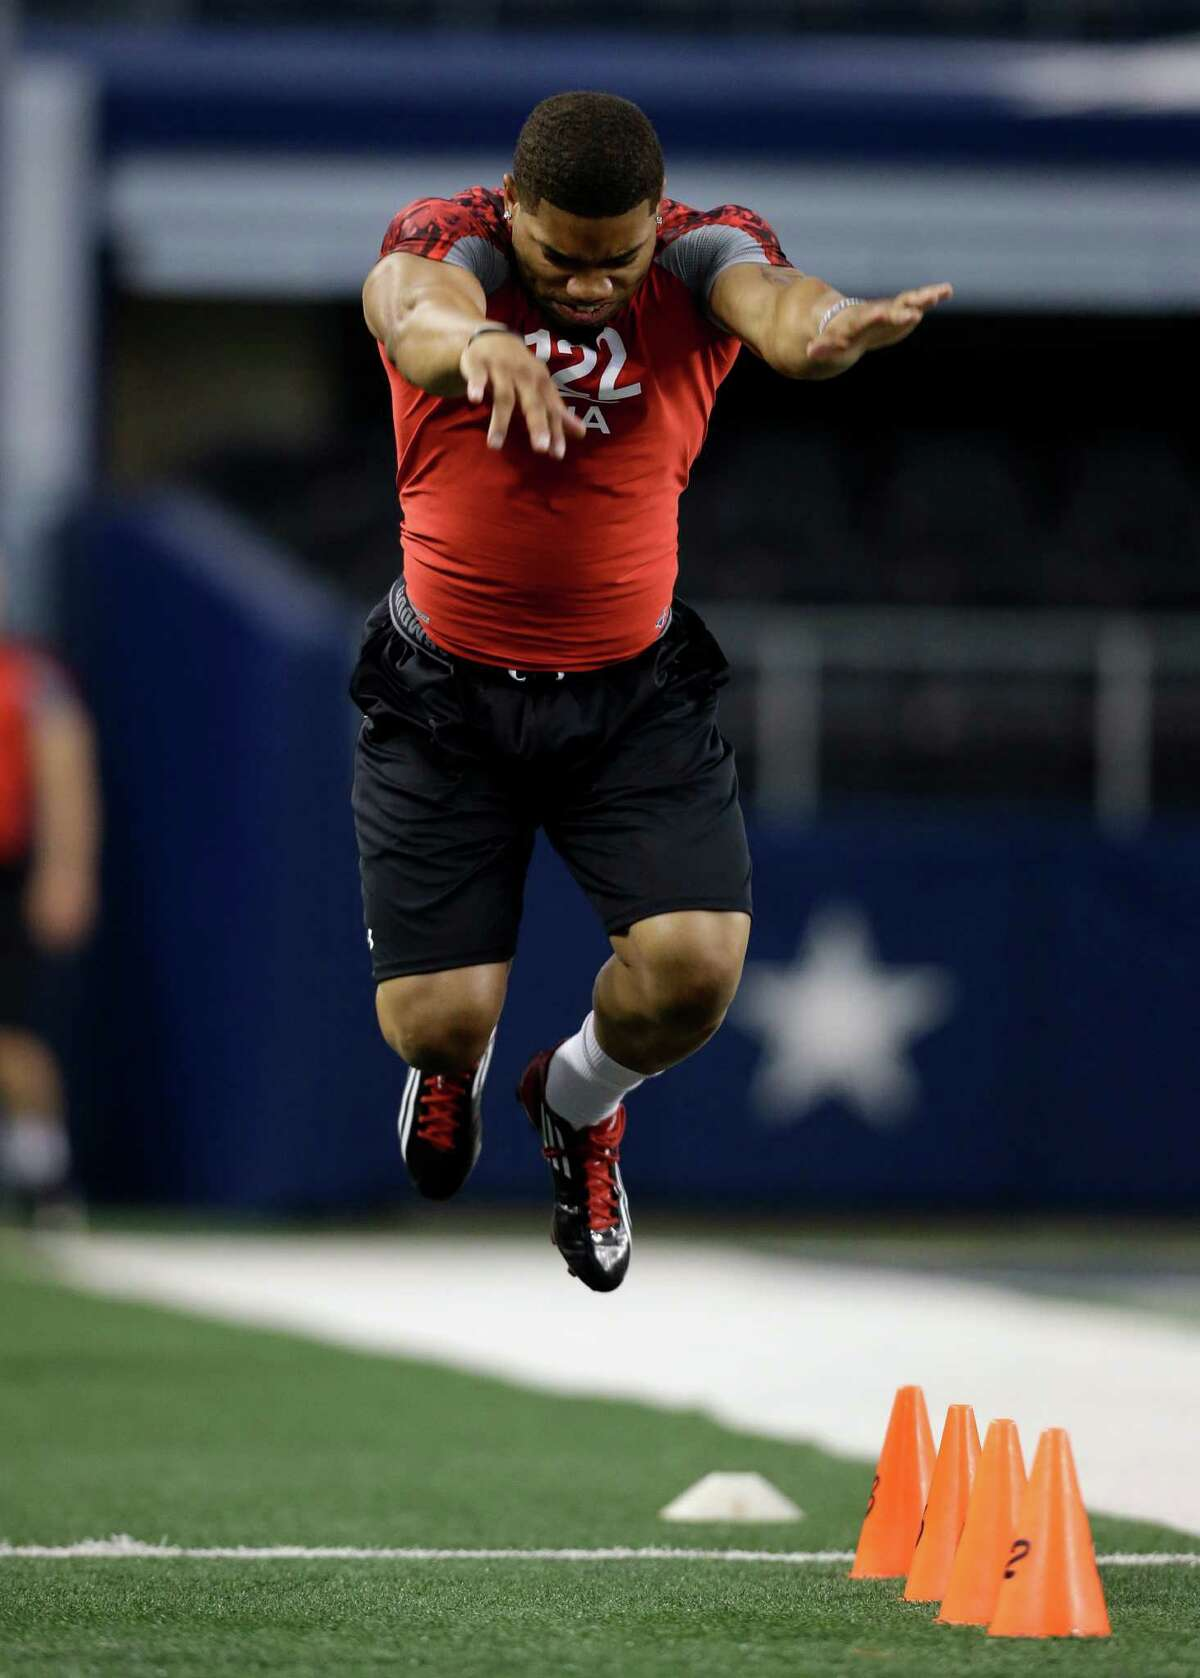 B.J. Daniels leaps forward during the broad jump at the NFL super regional football combine Monday, April 8, 2013, in Arlington, Texas. (AP Photo/Tony Gutierrez)